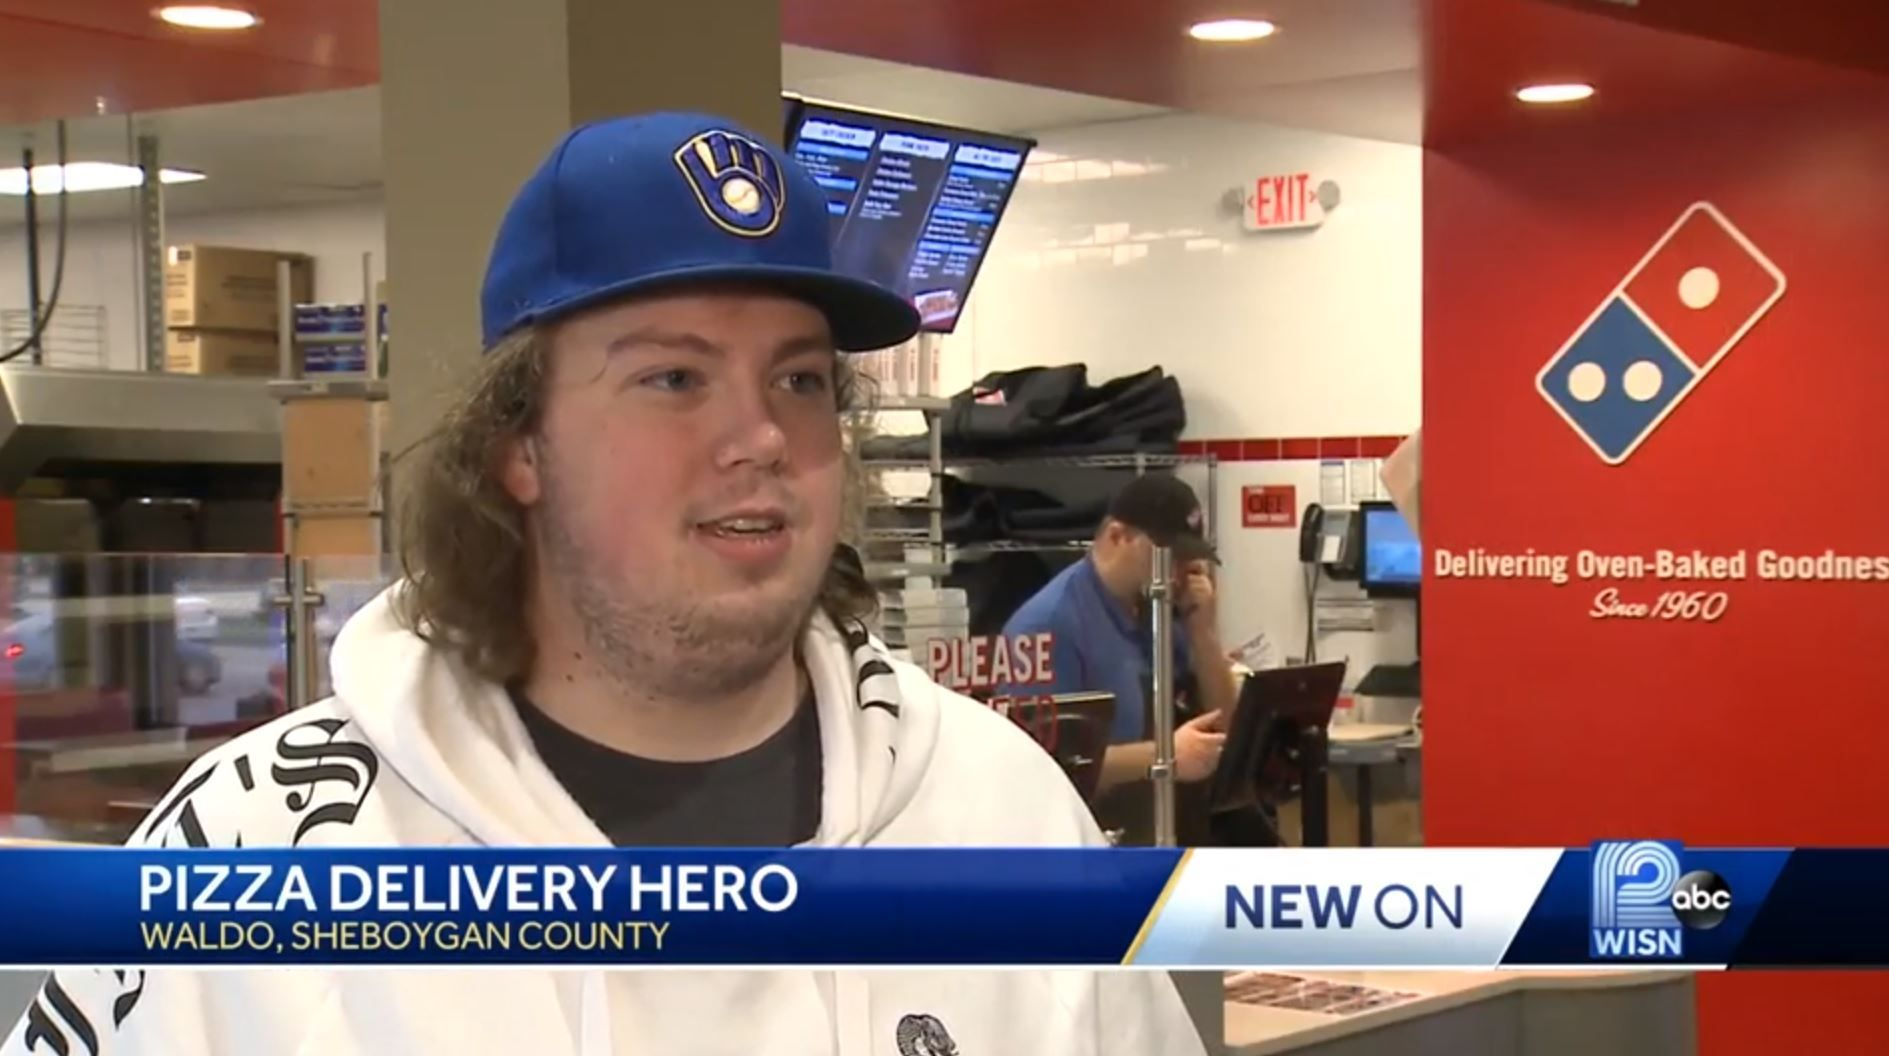 Joseph Grundl pizza delivery drive saved hostage